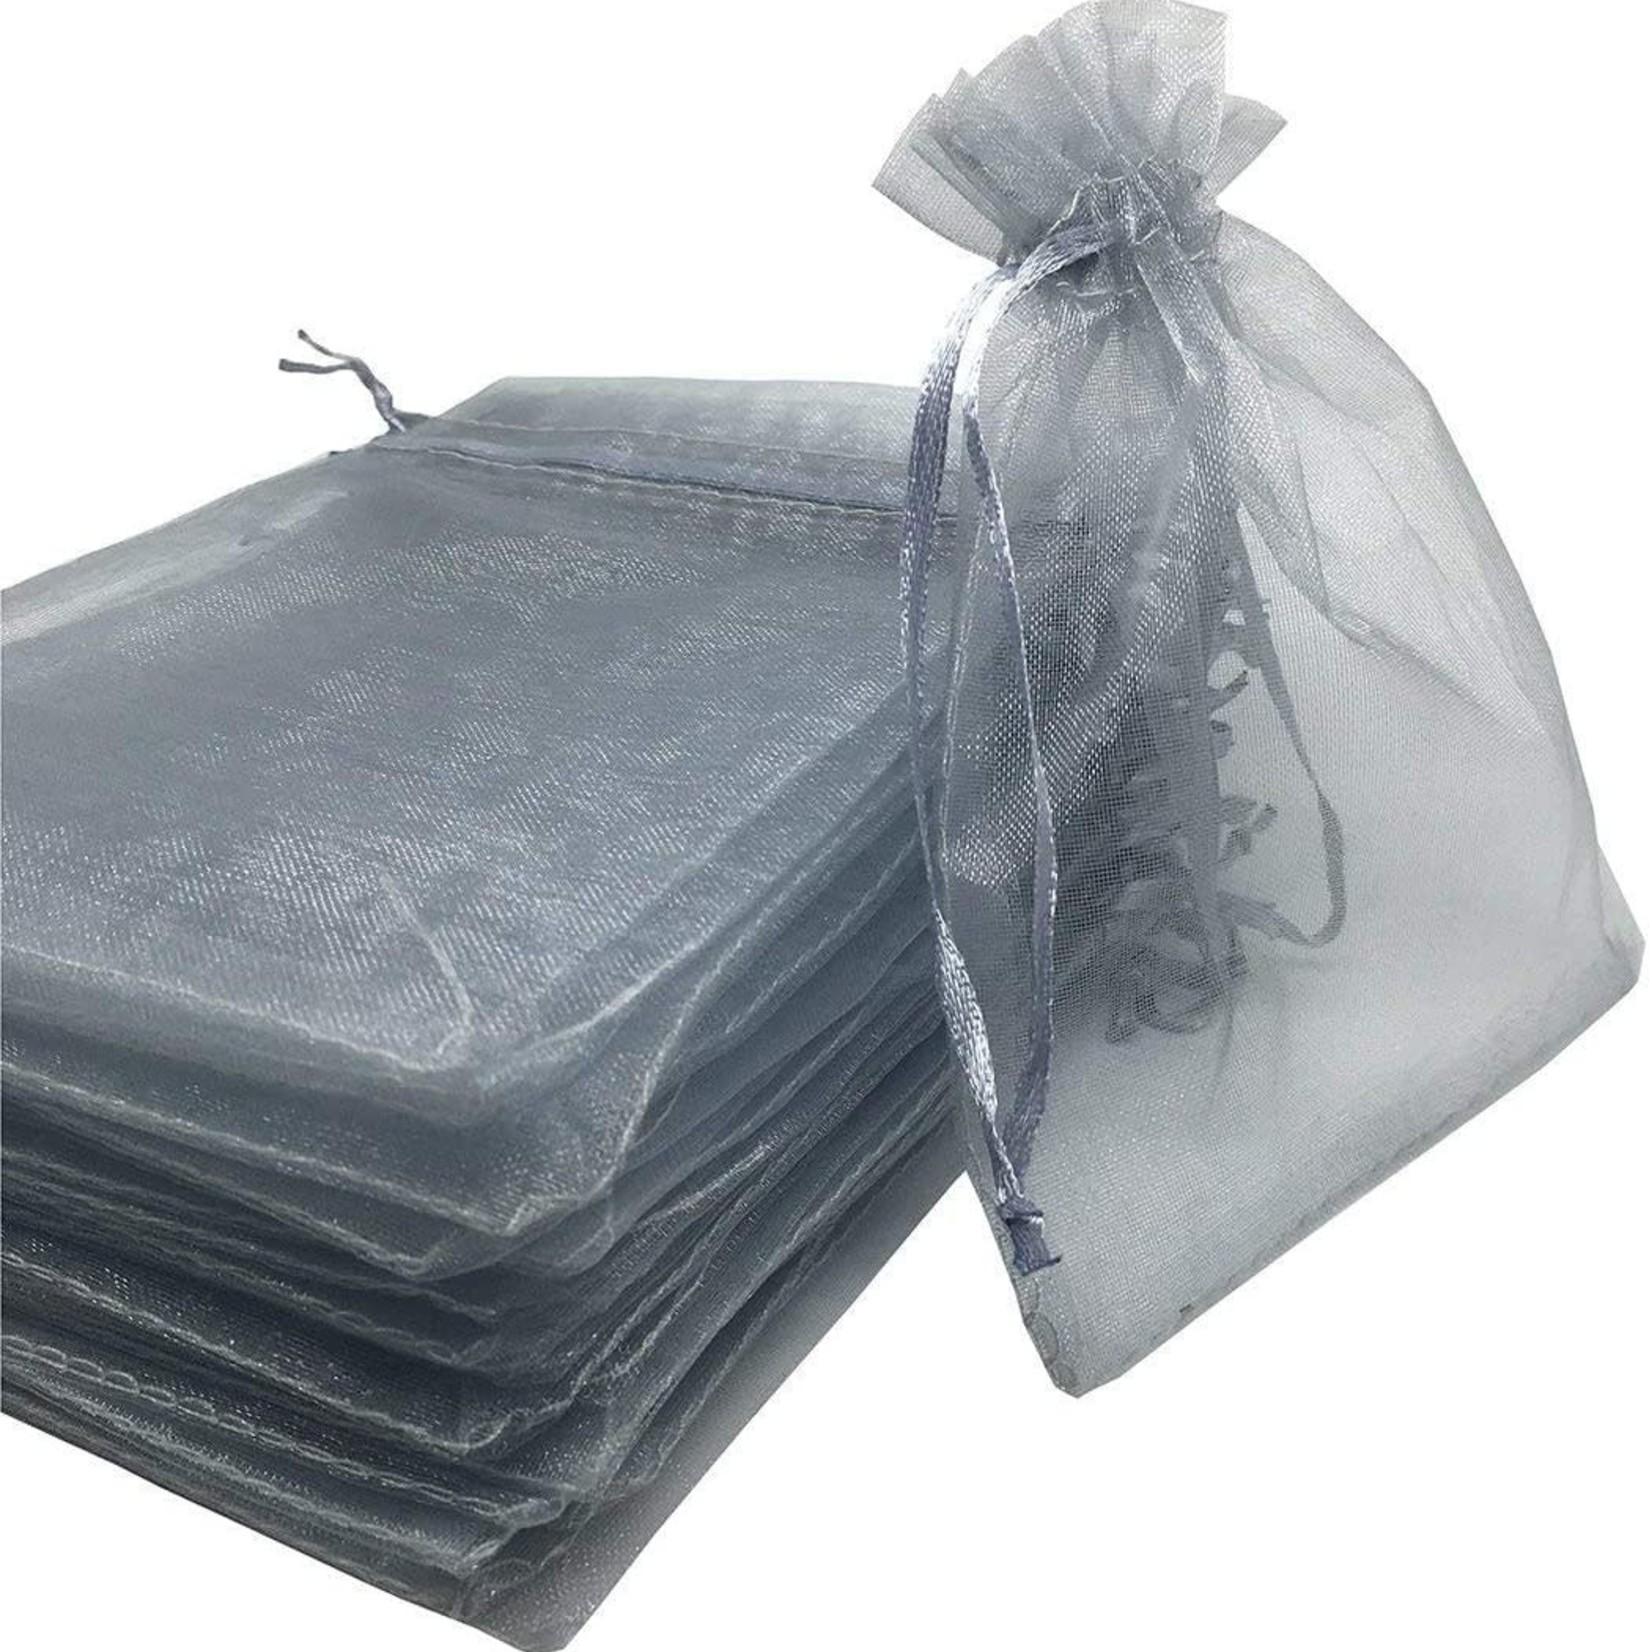 Organza Bags - Gray 3pk